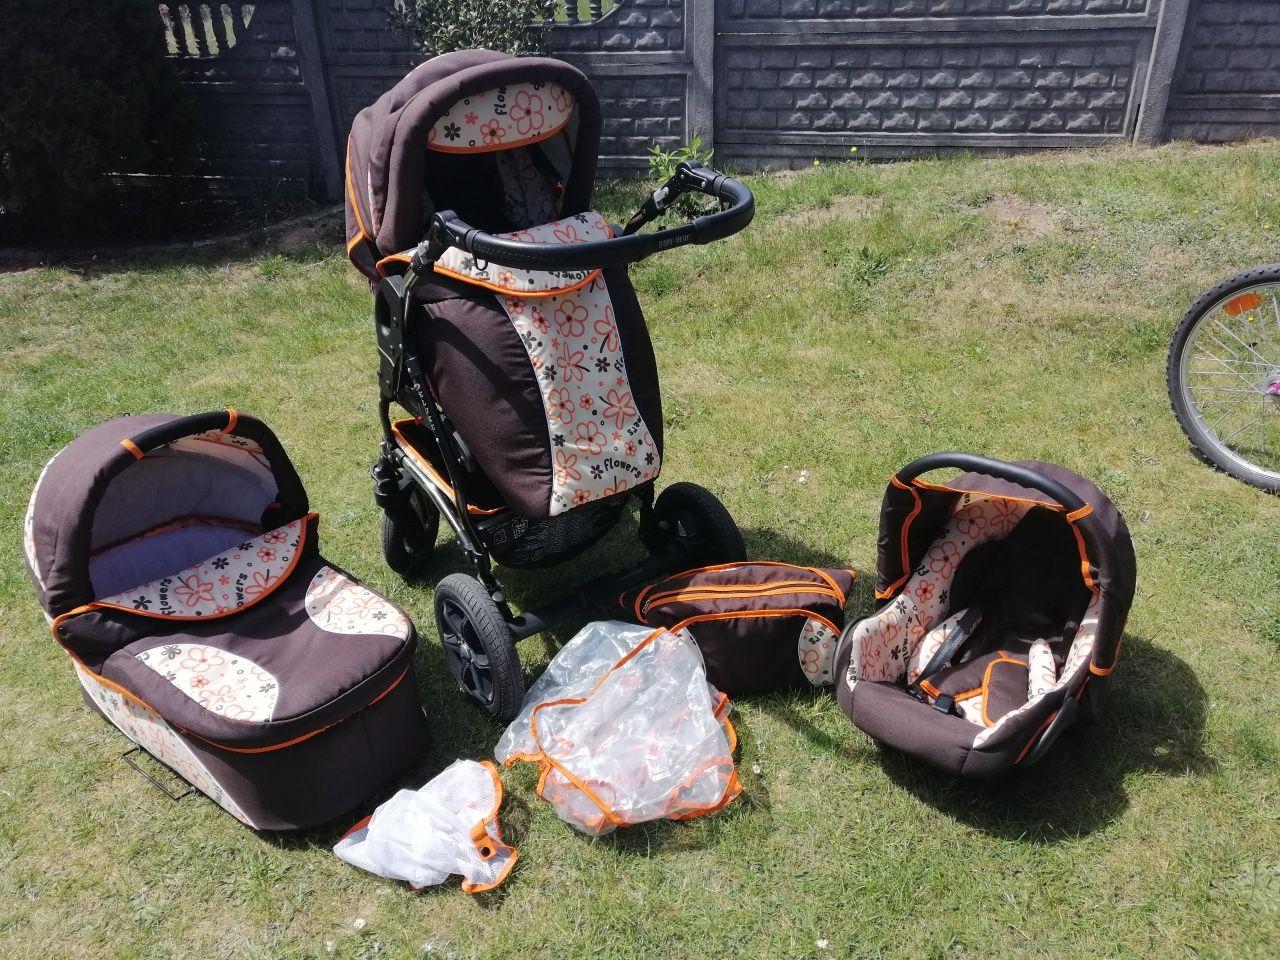 Wózek 3 w 1 baby merc, spacerówka, gondola, fotelik